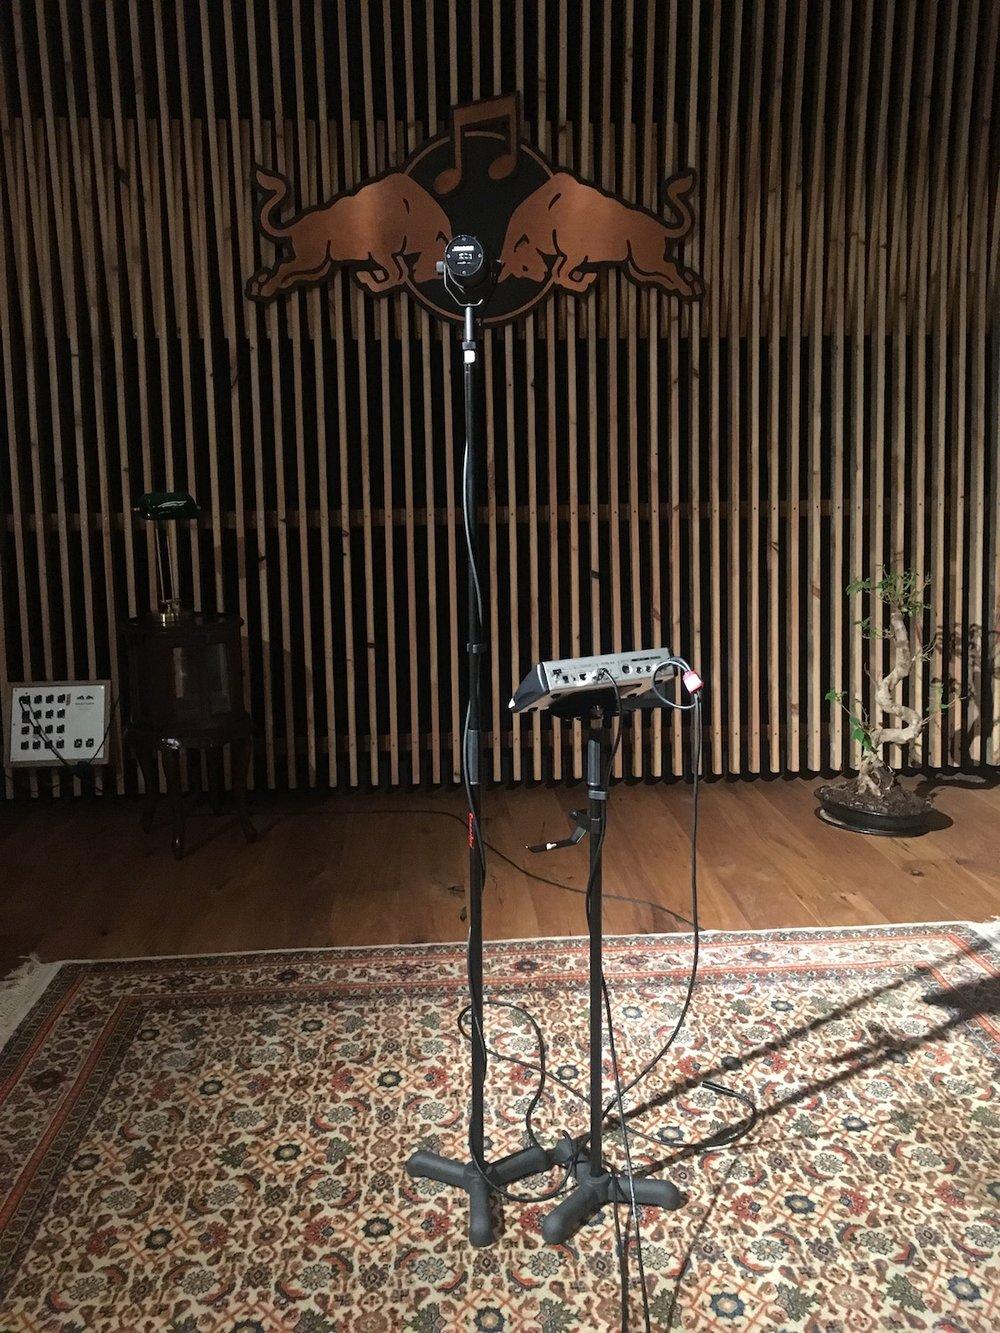 Yung-Nnelg-Red-Bull-Studios-uncut-vocals-Sennheiser-SM7B-microphone-The-Wong-Janice.jpg